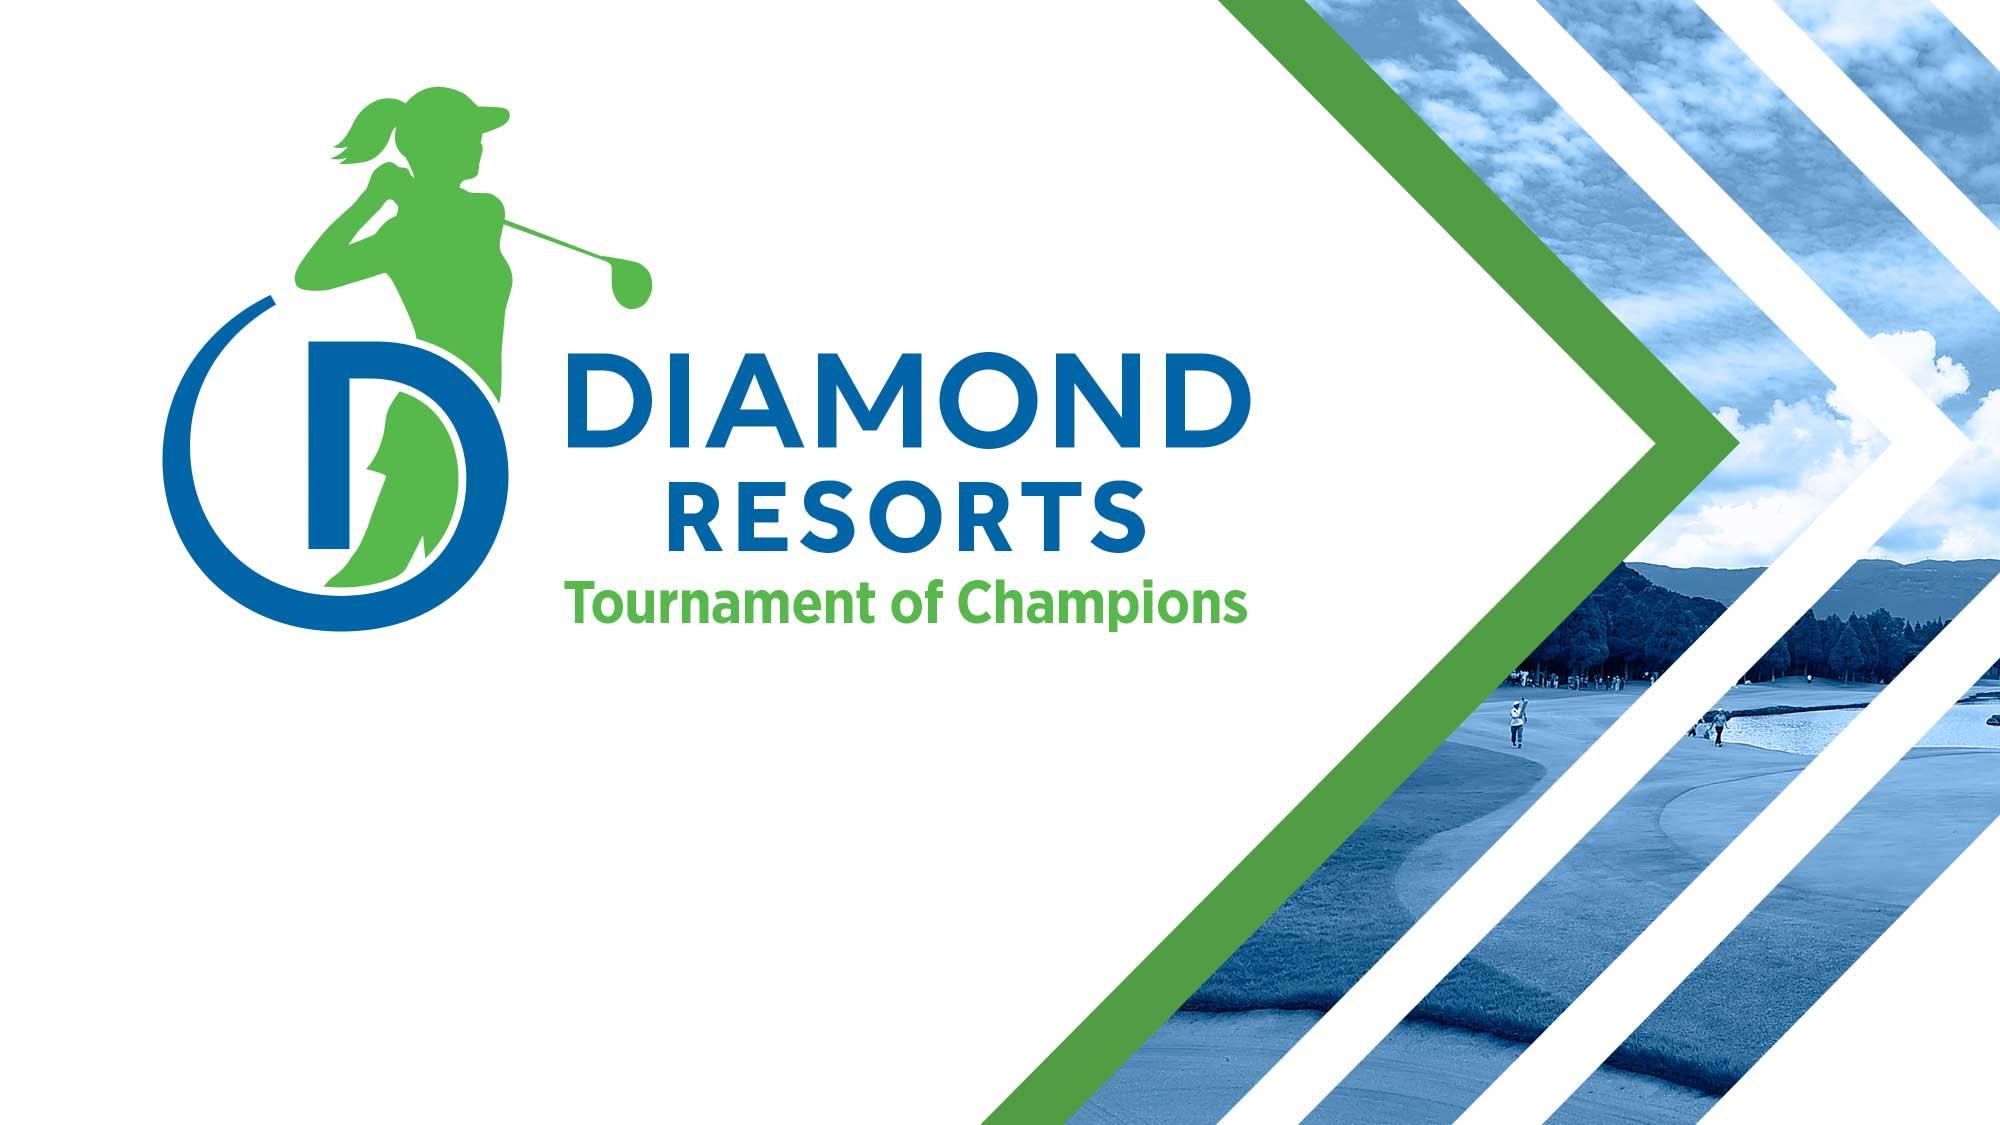 Diamond Resorts Tournament of Champions to Kick Off 2019 LPGA Season